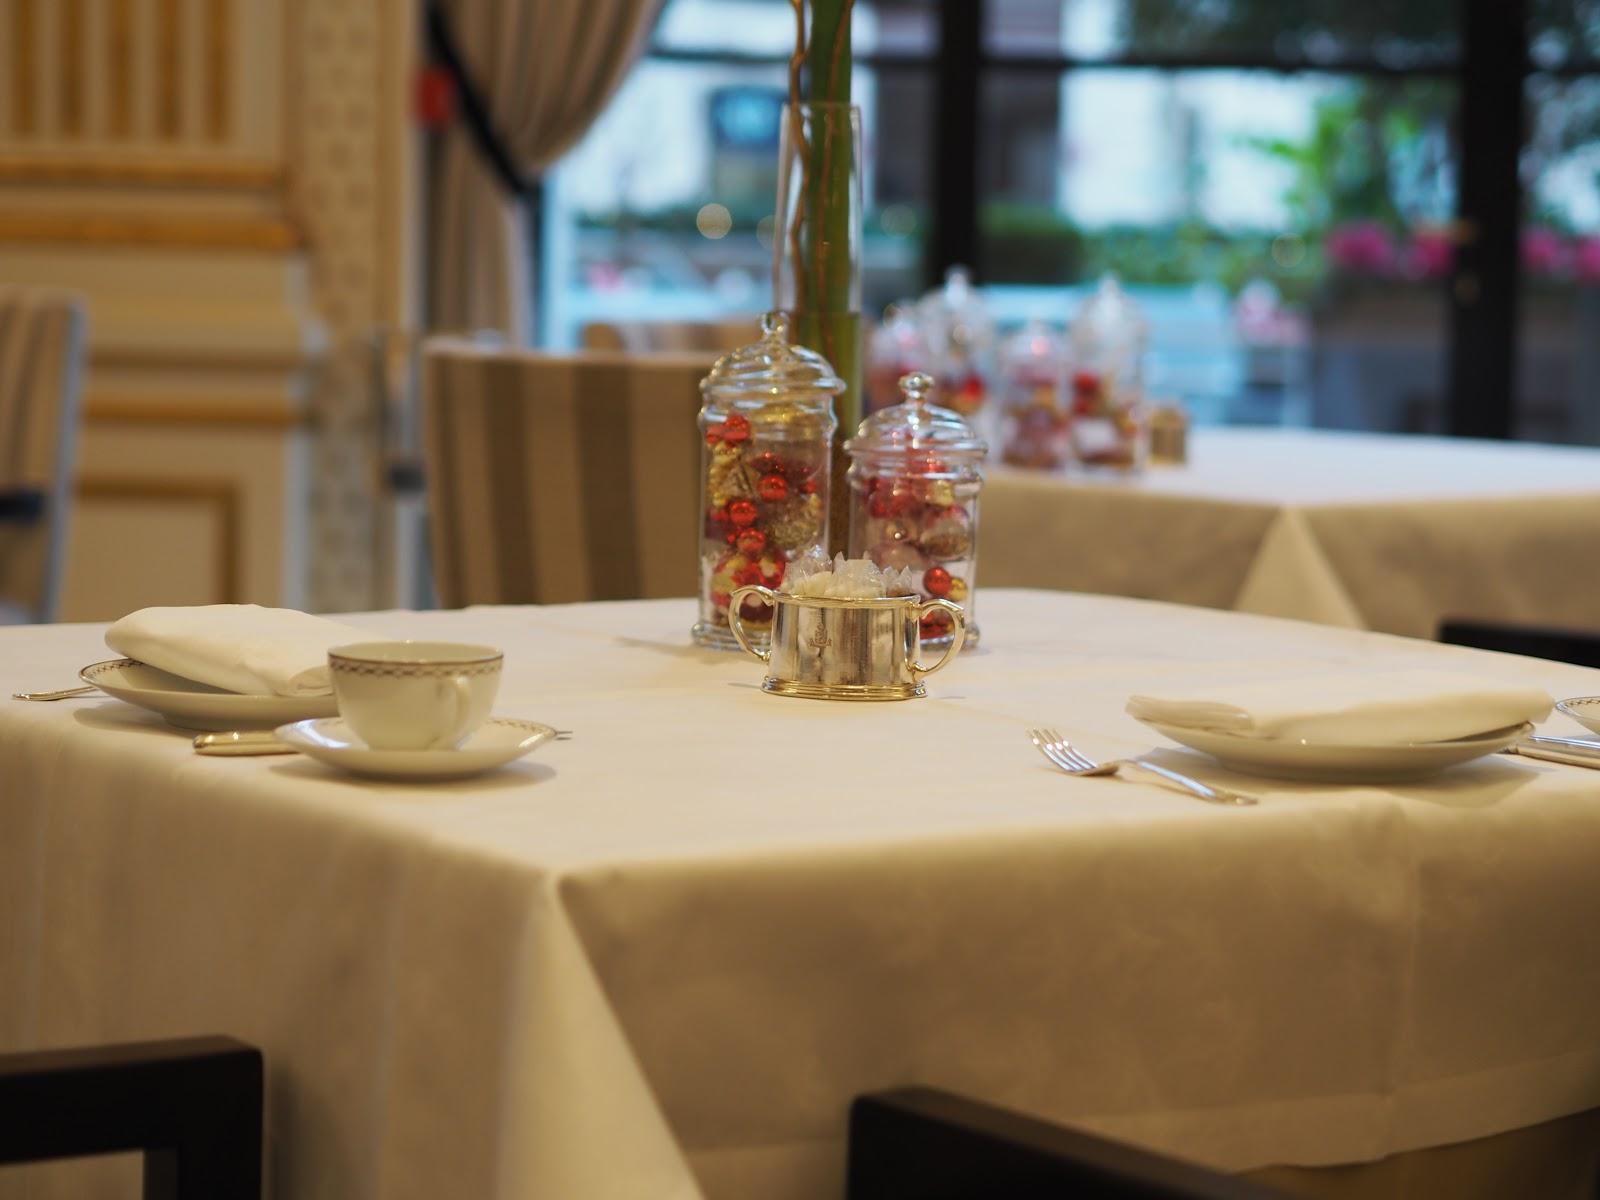 Peninsula Hotel, Paris, Afternoon Tea table